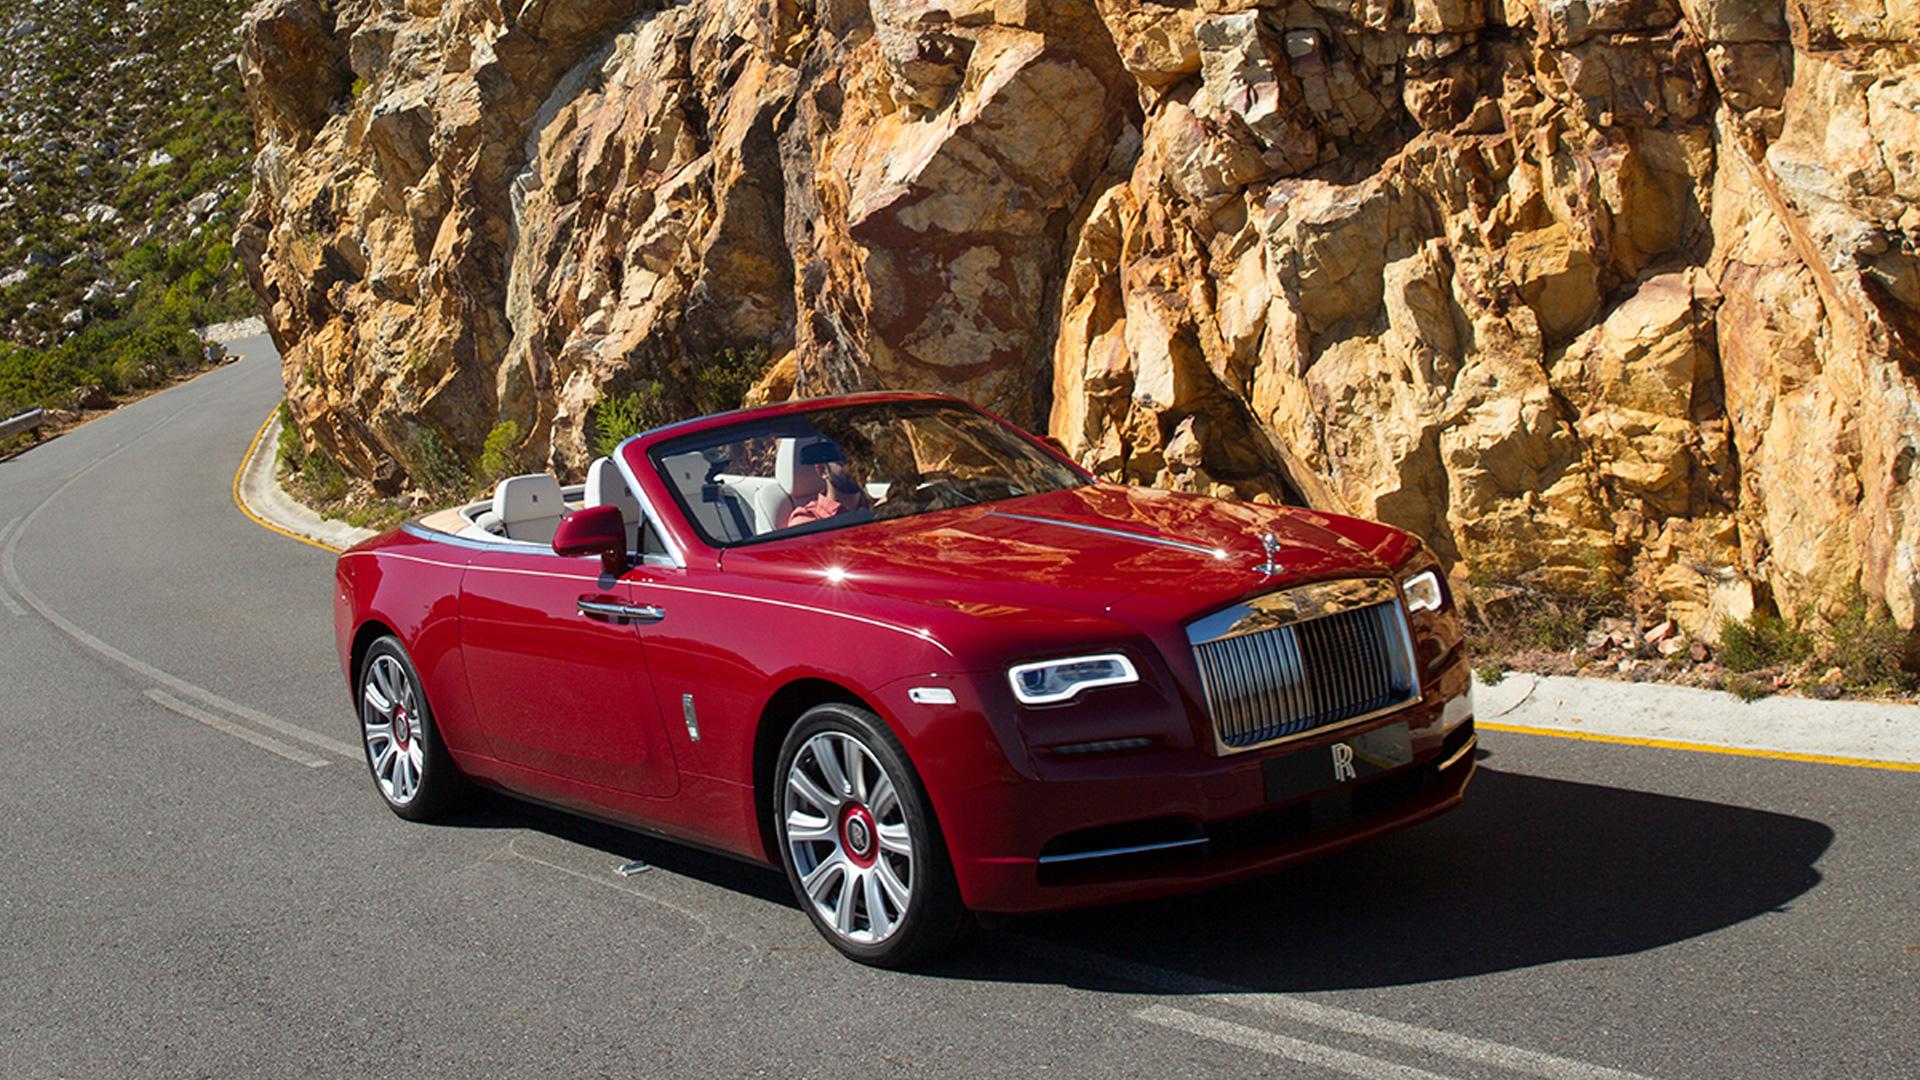 Rolls Royce Dawn 2016 Std Price Mileage Reviews Specification